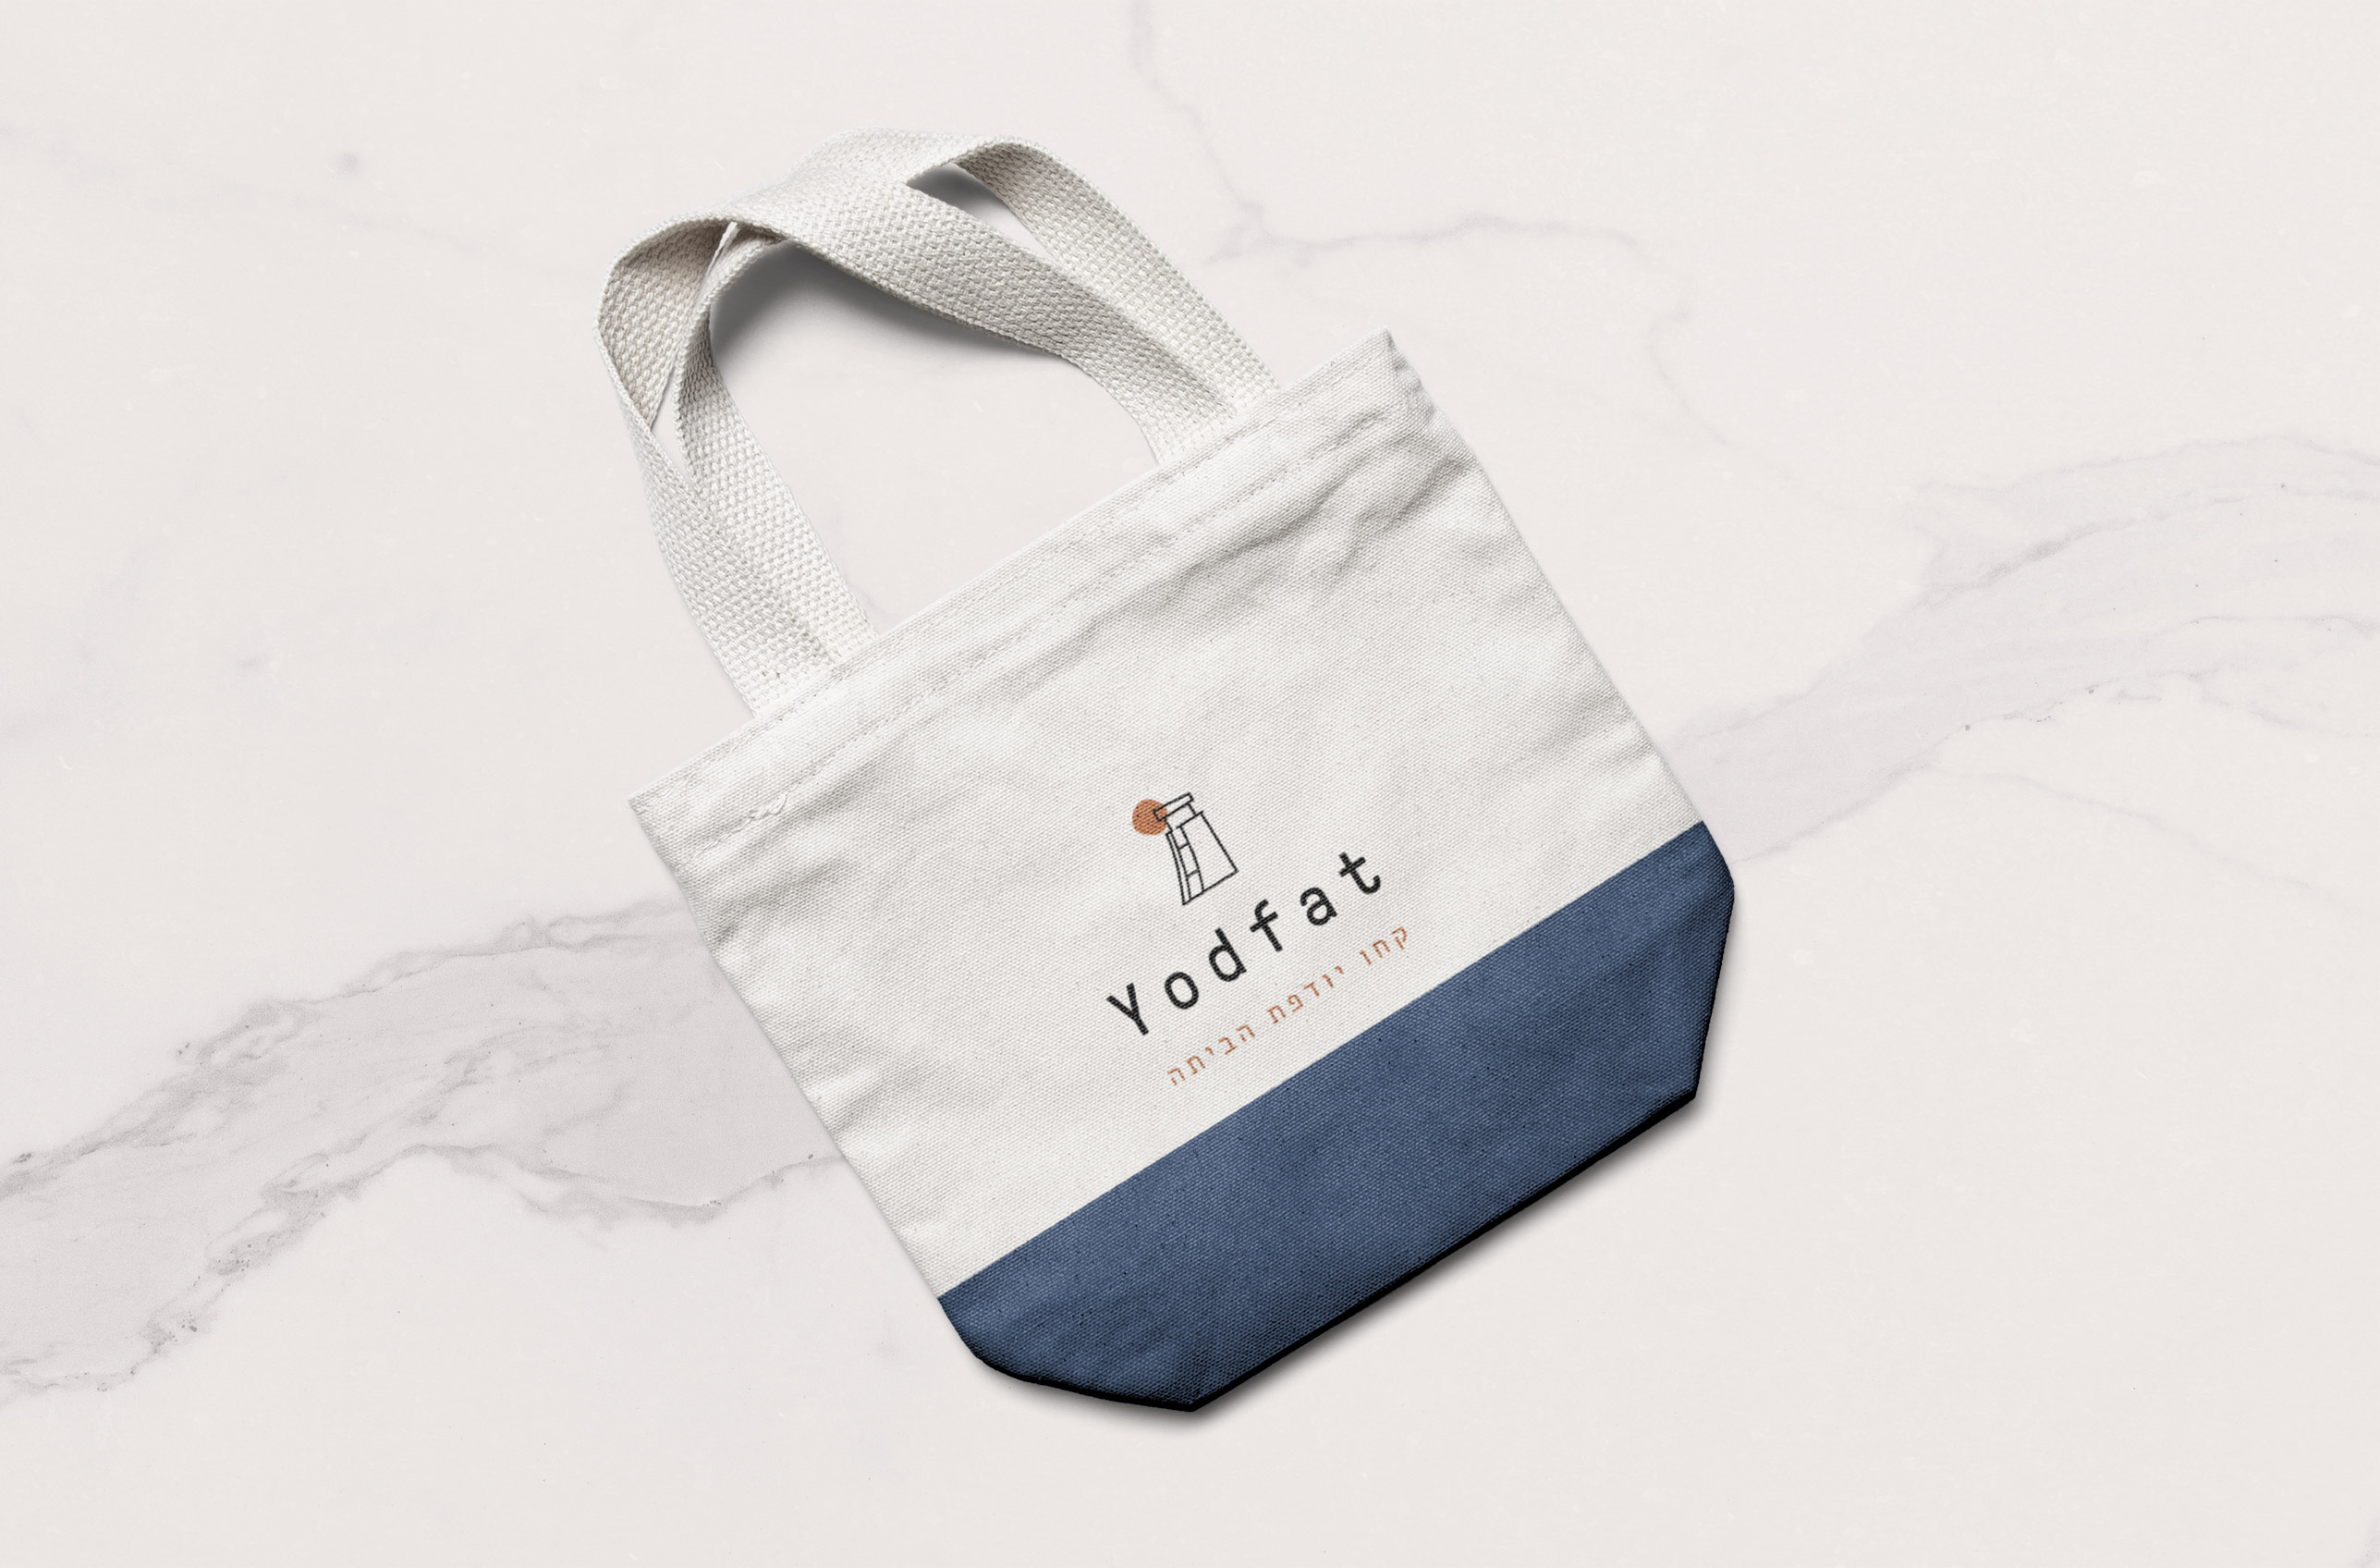 Yodfat.shop, Crossing parallels Studio